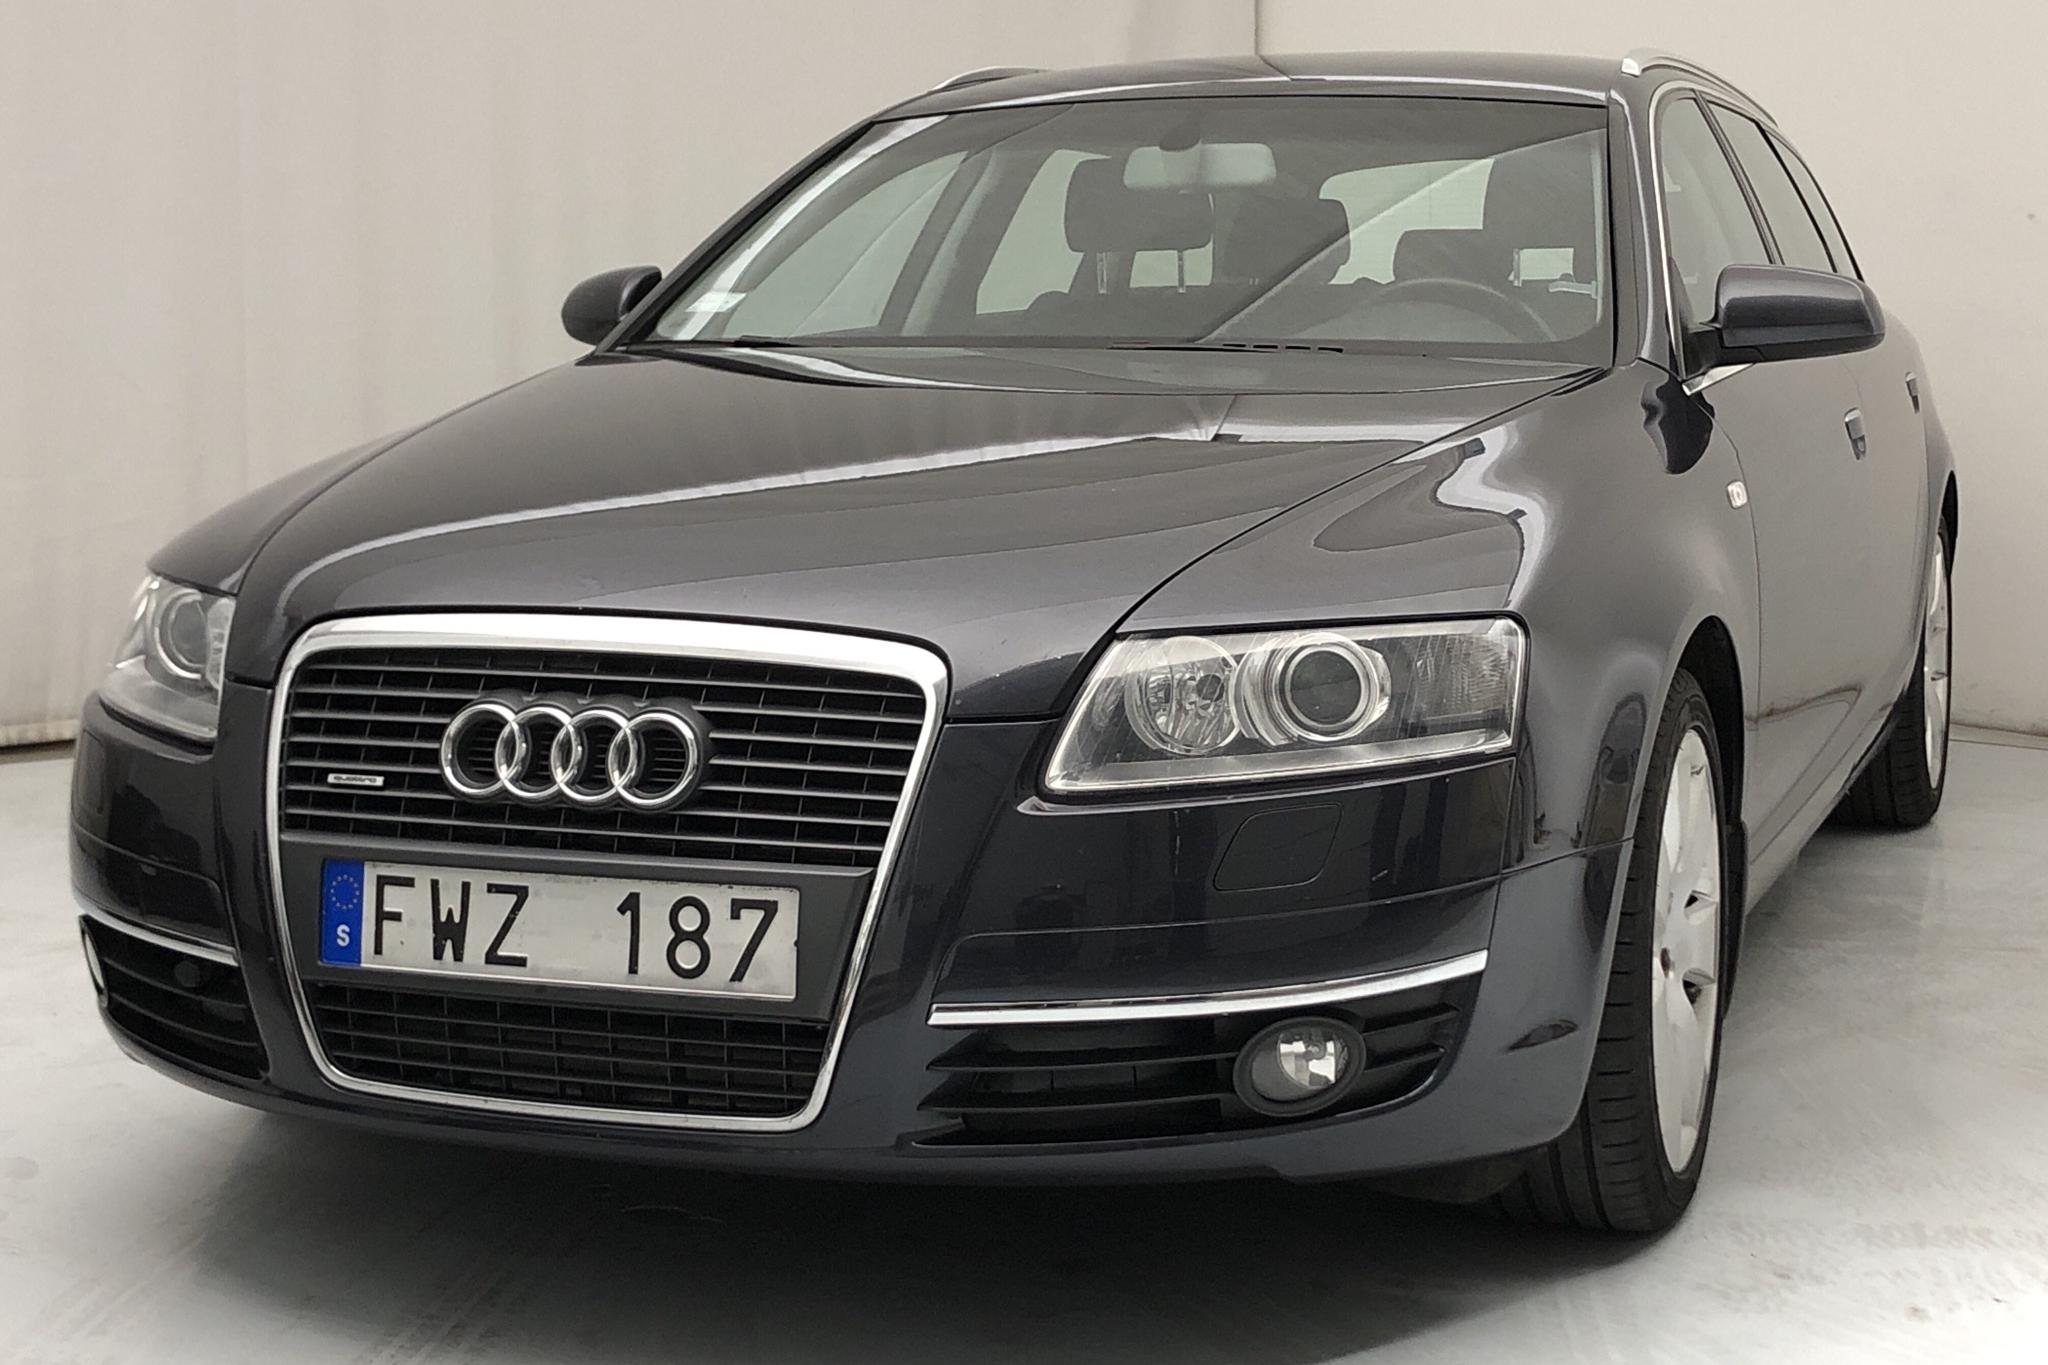 Audi A6 3.0 TDI Avant quattro (233hk) - 200 740 km - Automatic - Dark Grey - 2008